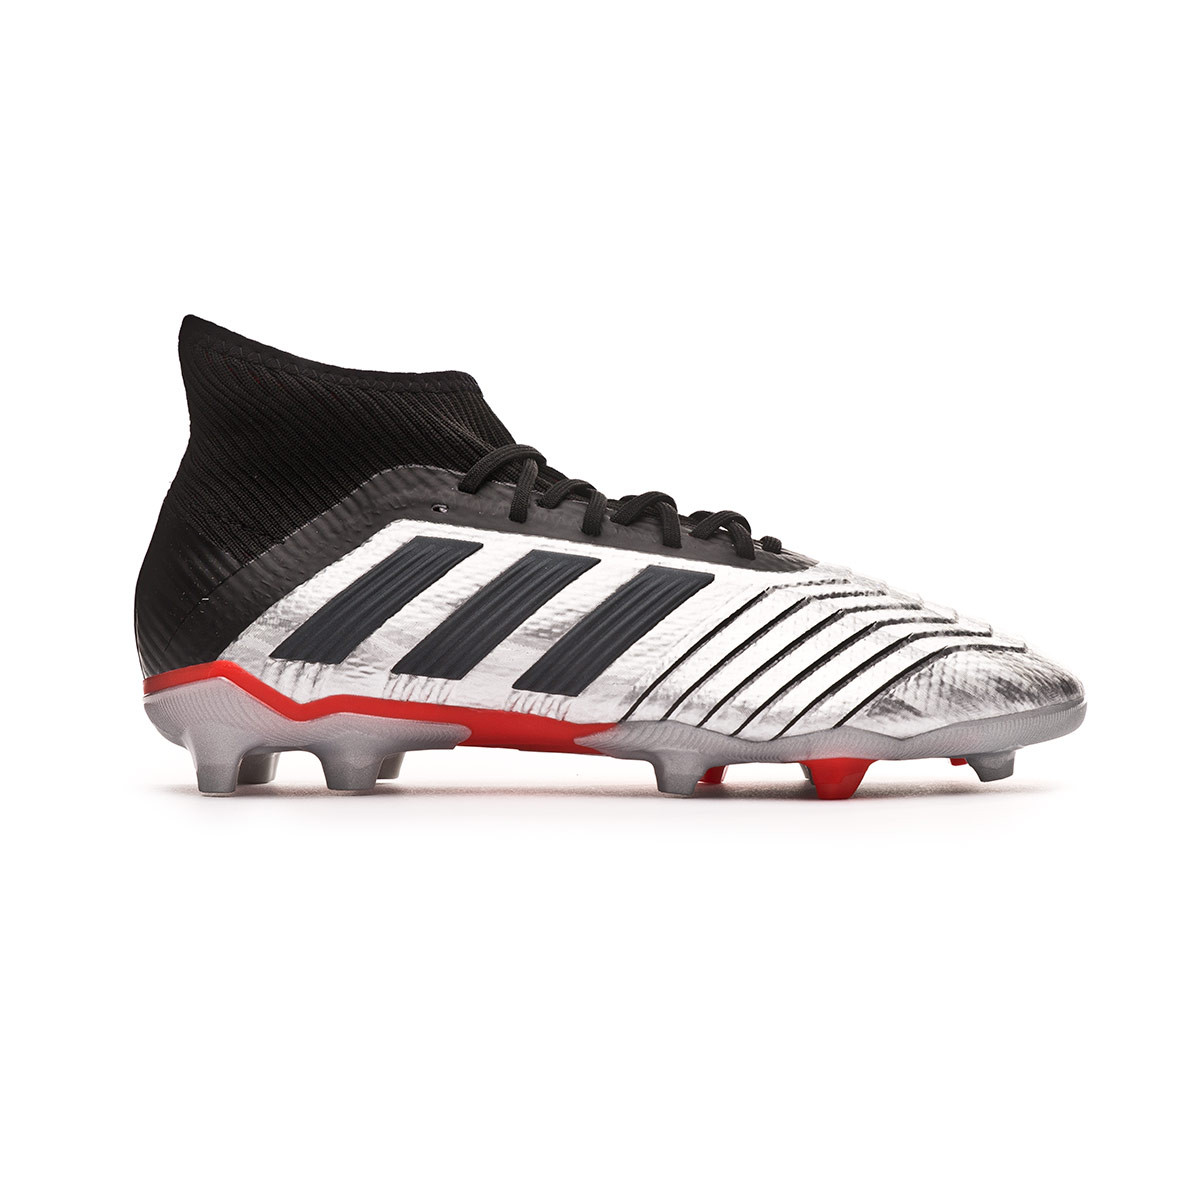 scarpe calcio adidas predator | Benvenuto per comprare